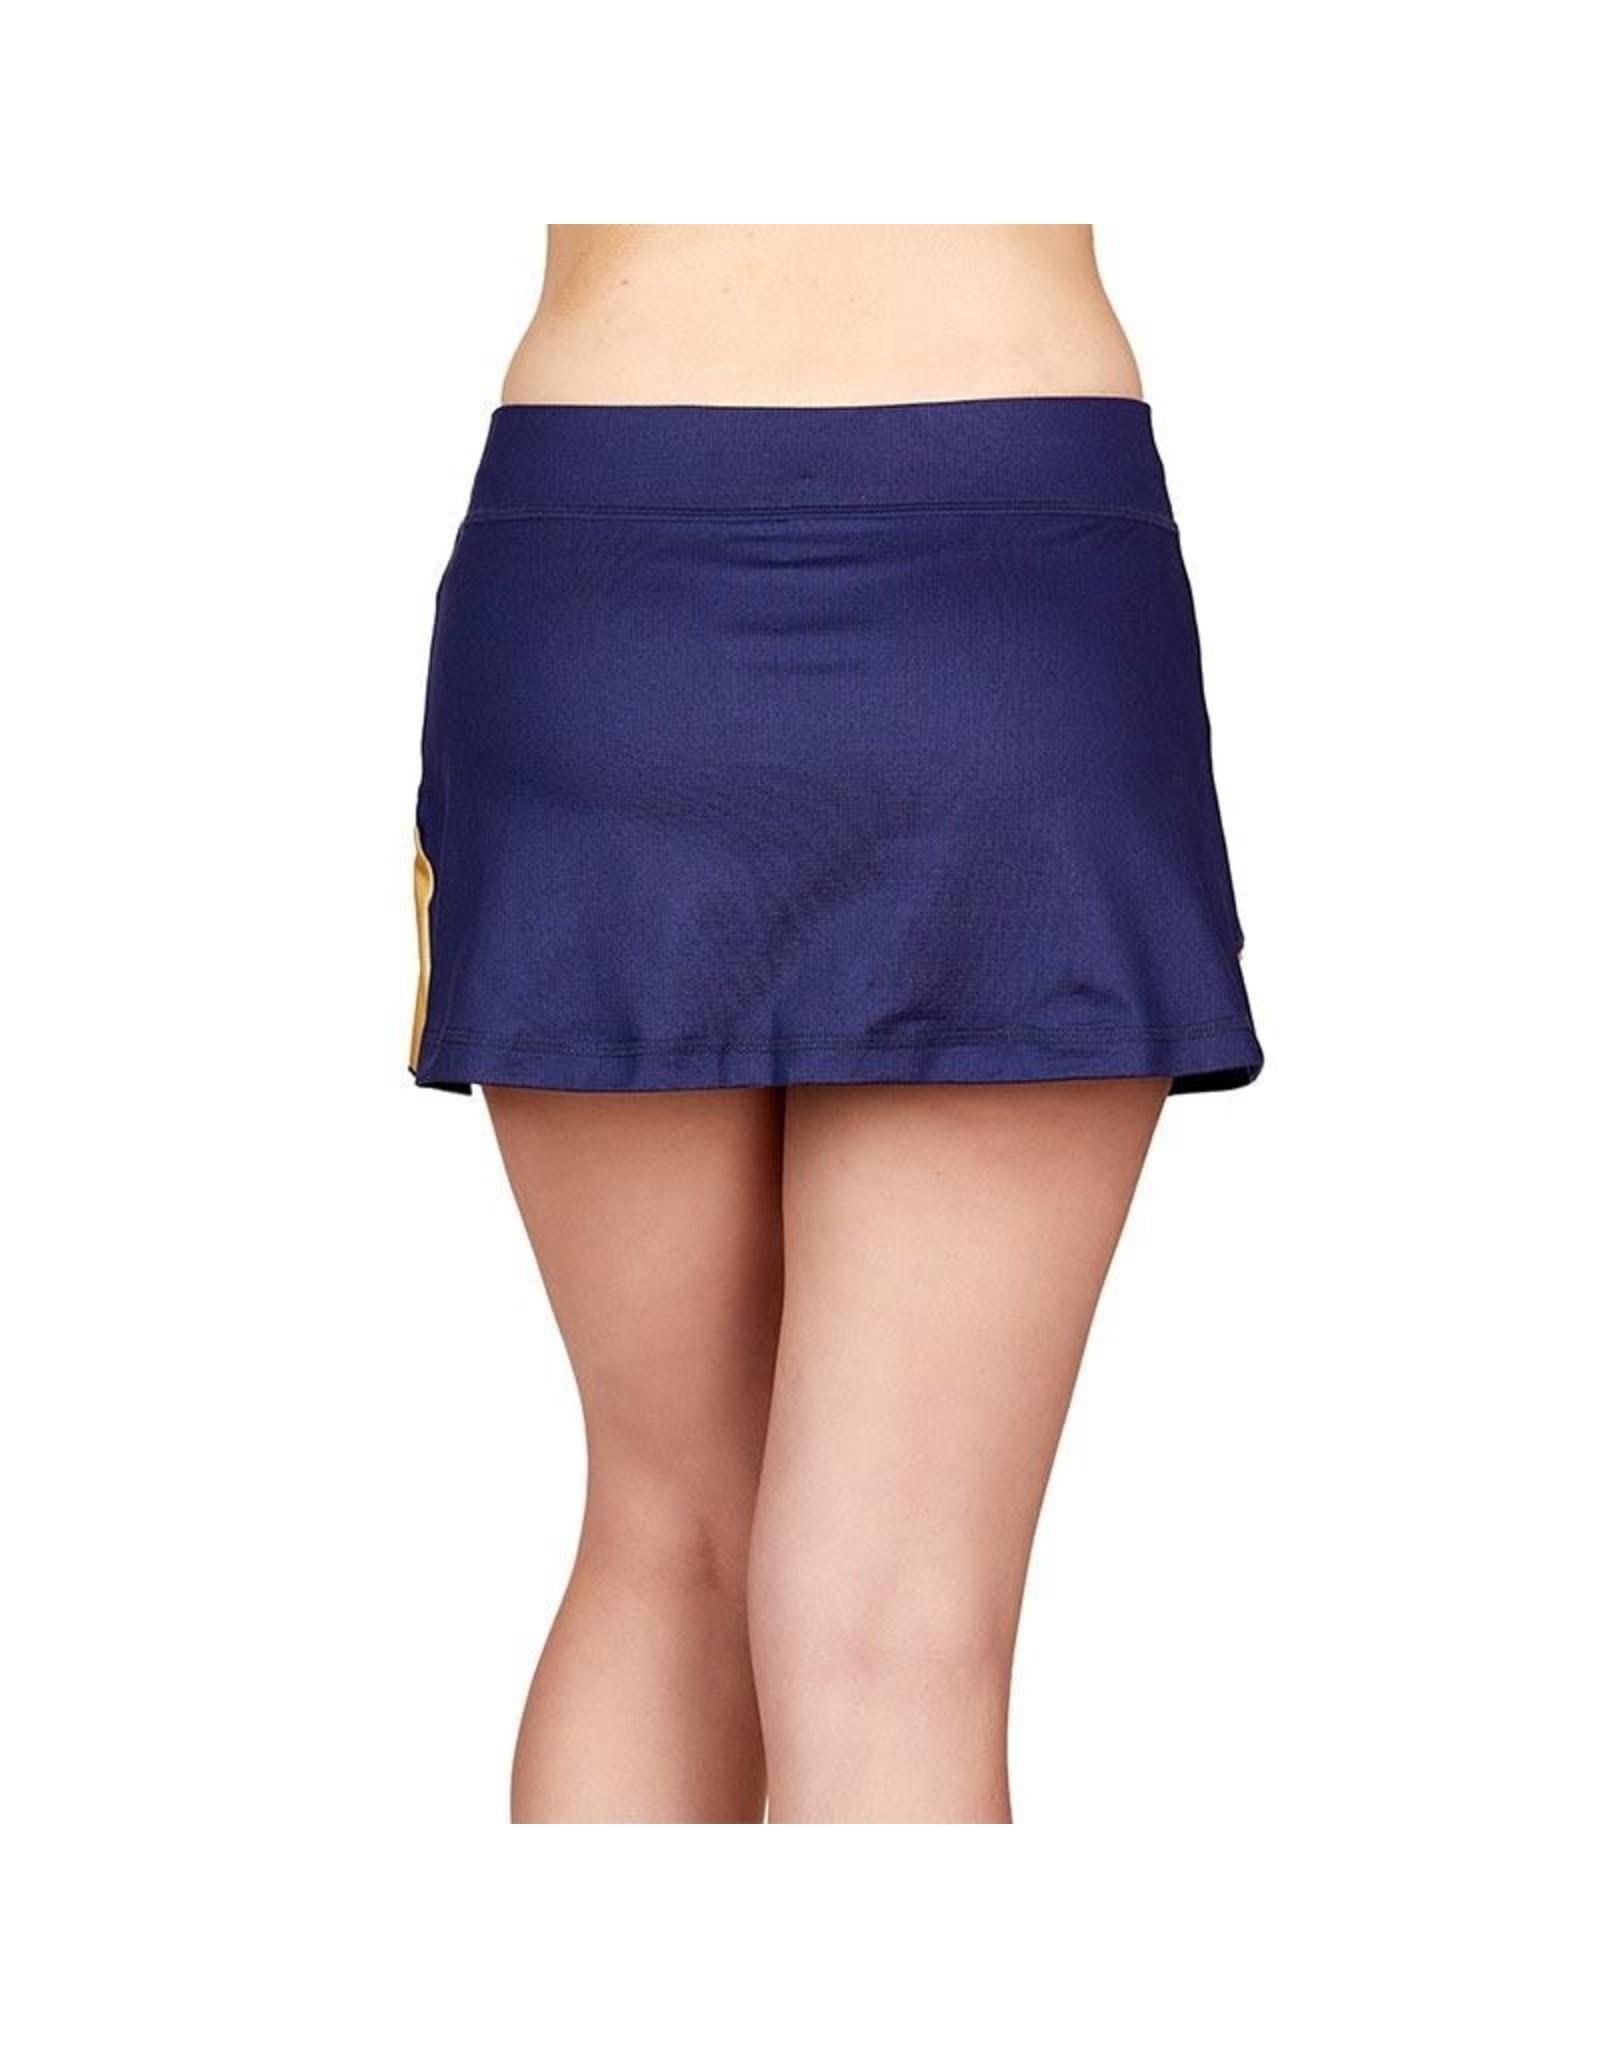 Sofibella Allure 13 inch Skirt